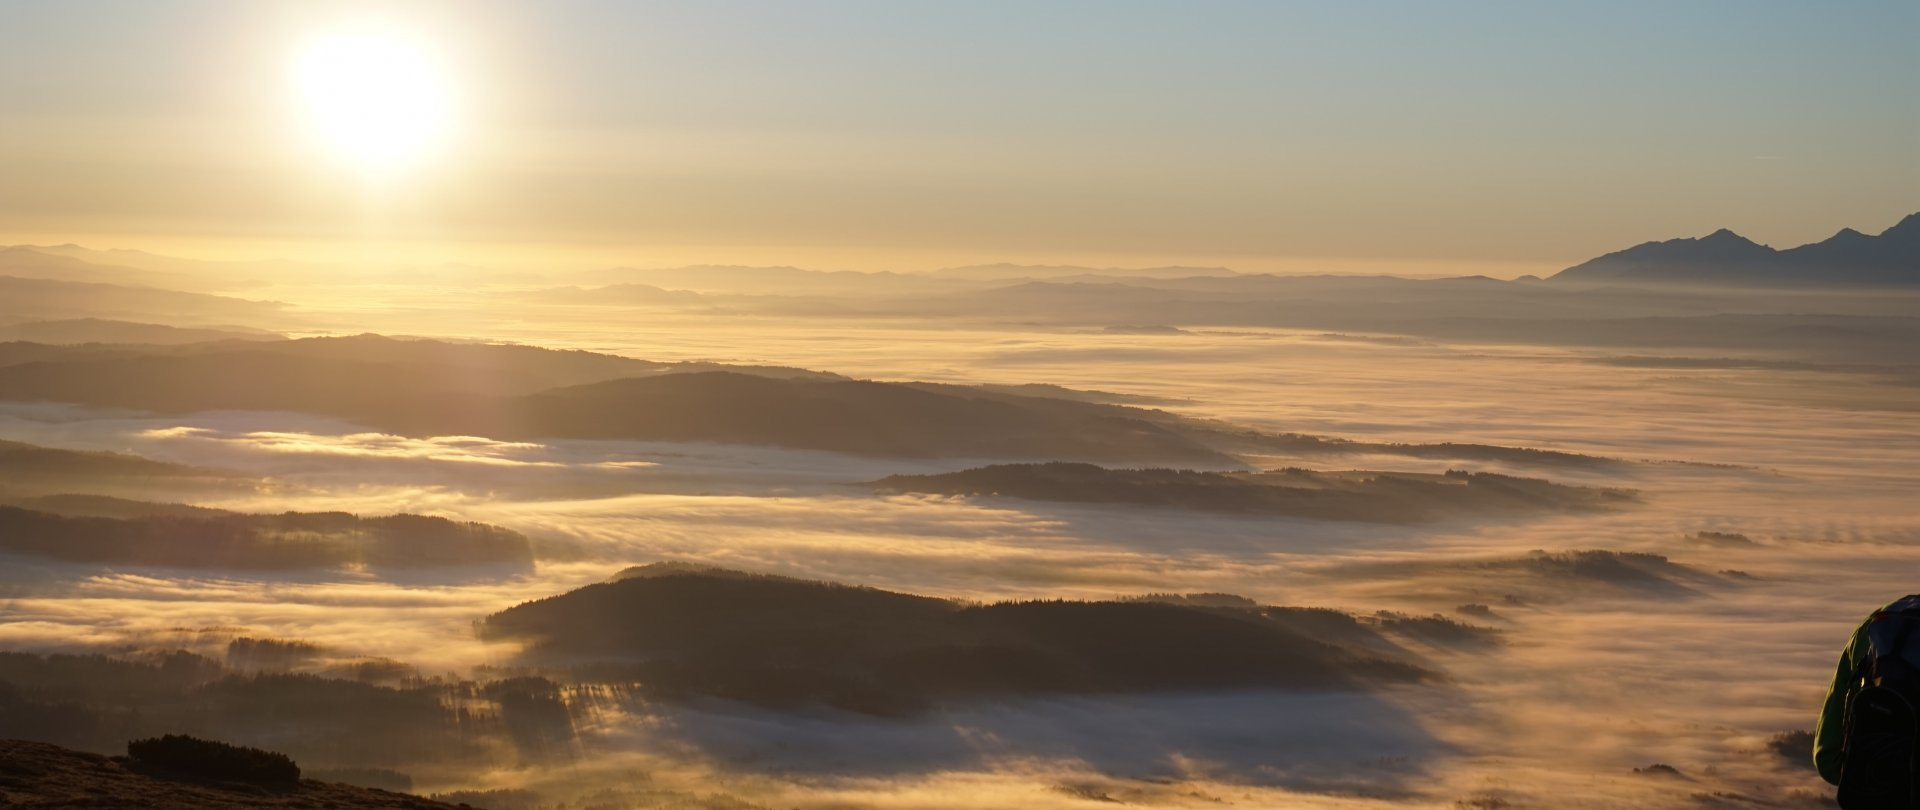 Nationalpark Babia Gora - Babia Gora (Diablak) 1725 m über dem Meeresspiegel